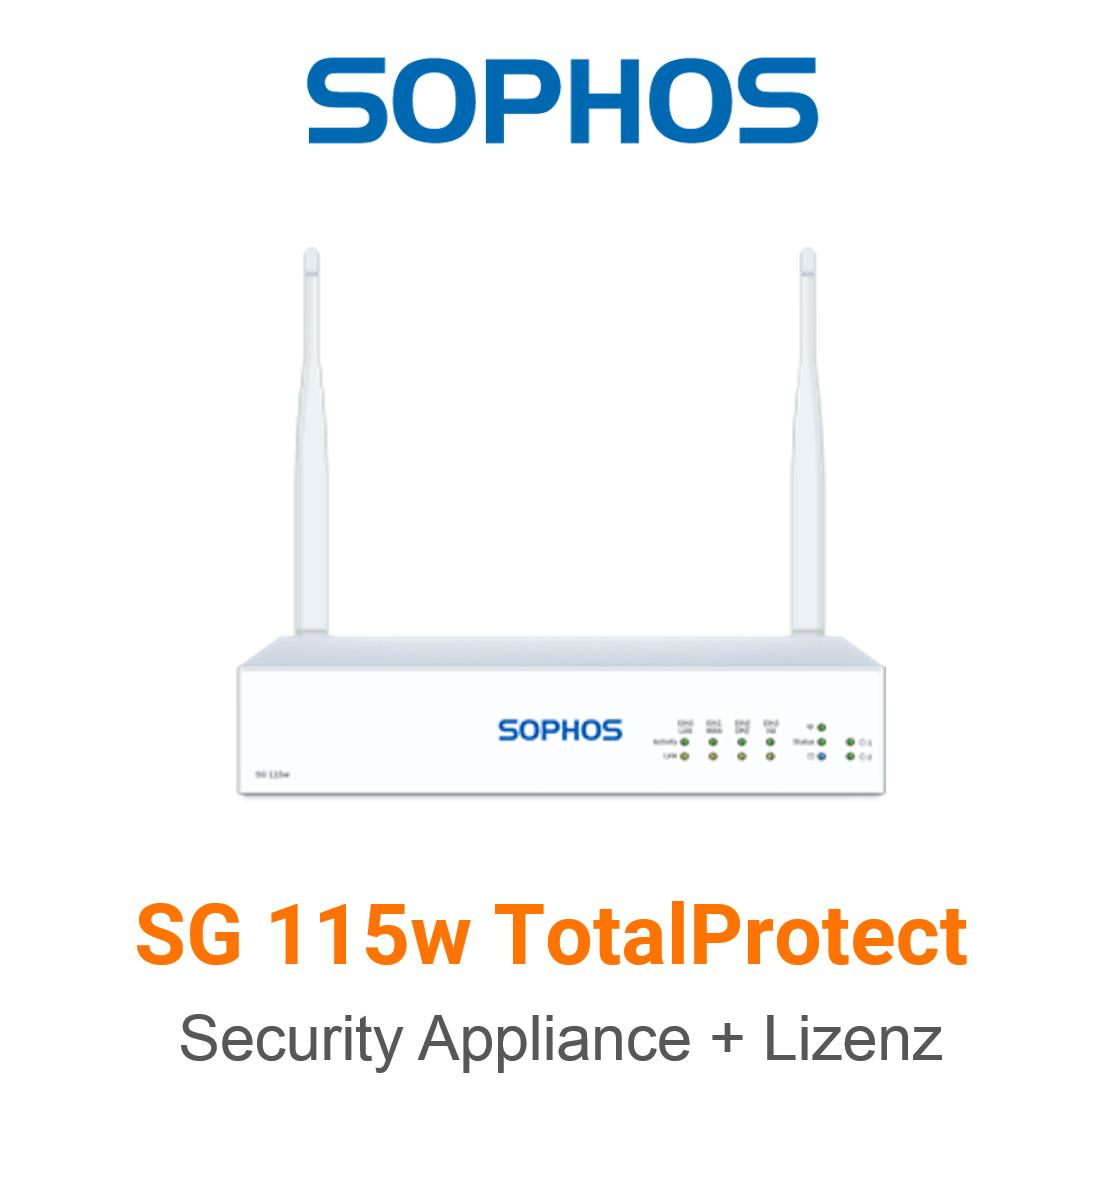 Sophos SG 115w TotalProtect Bundle (Hardware + Lizenz)